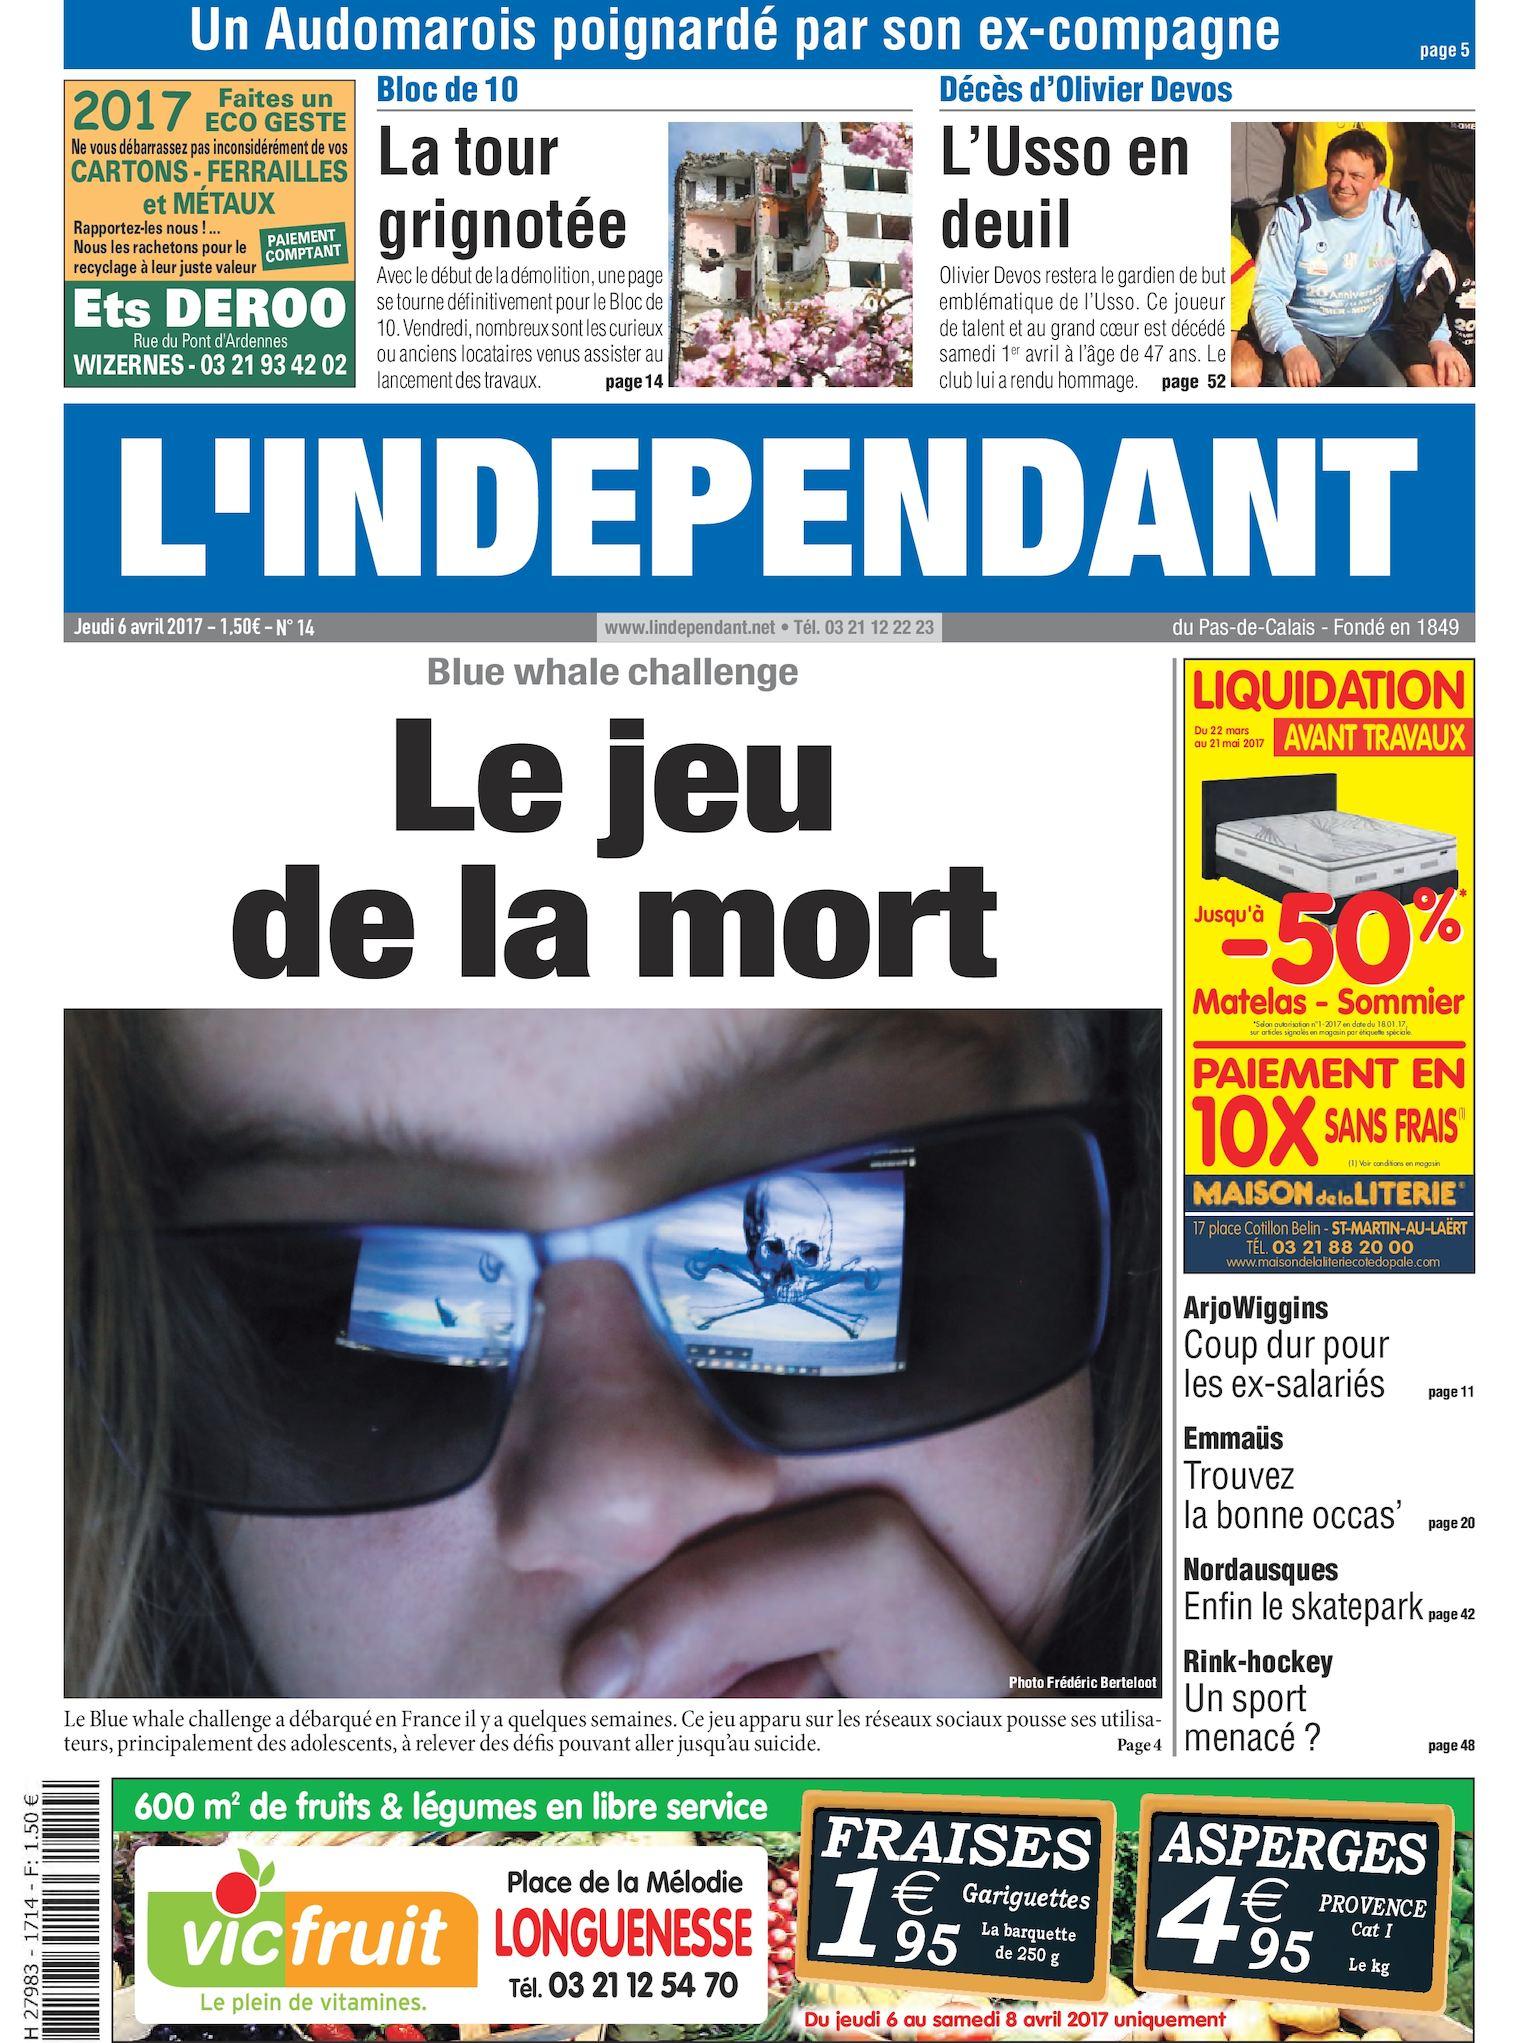 Calaméo - L indépendant Semaine 14 2017 a2c4c8ccb5b8